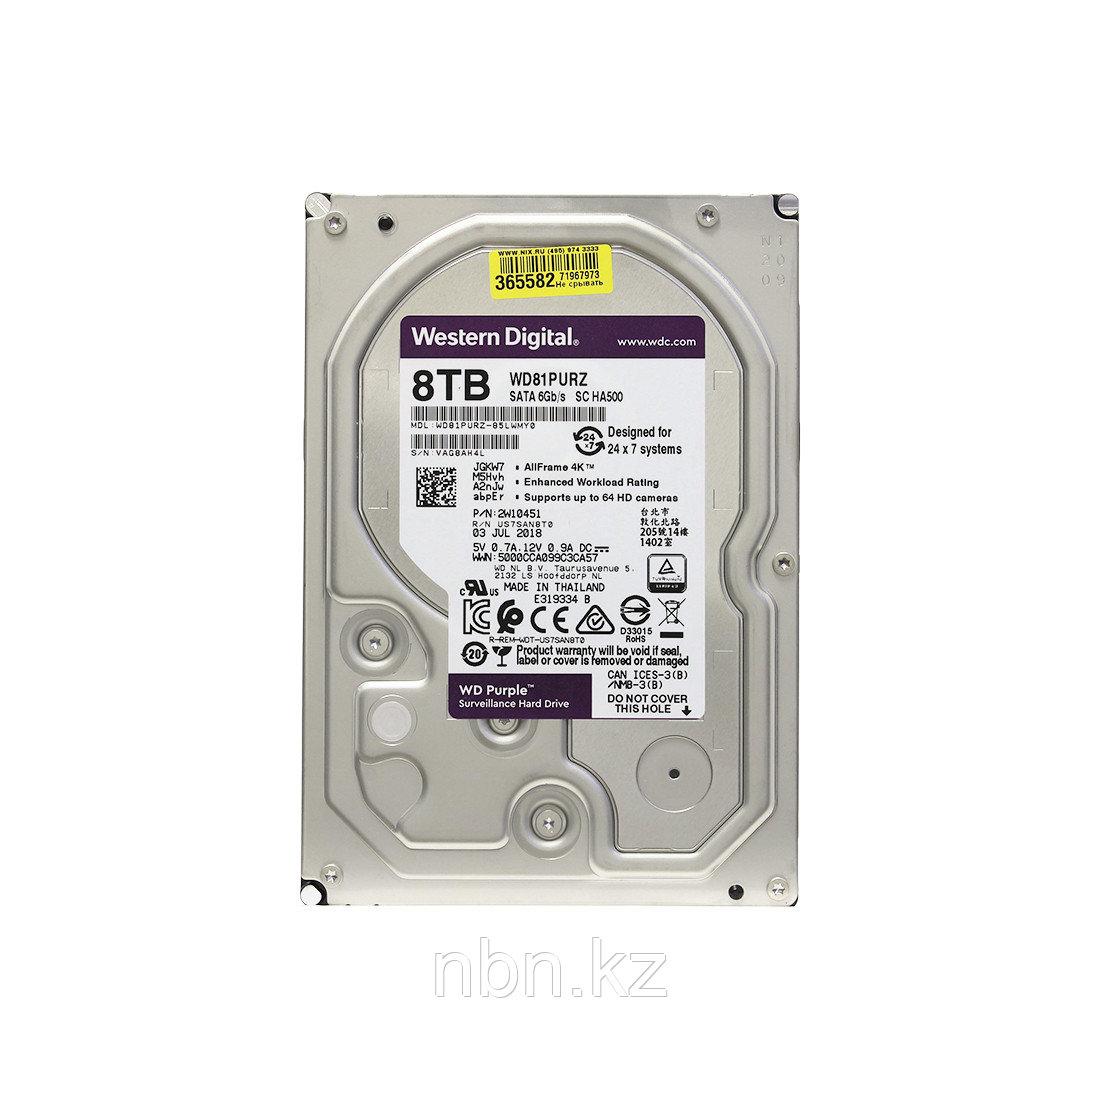 Жёсткий диск для видеонаблюдения Western Digital Purple HDD 8Tb WD81PURZ